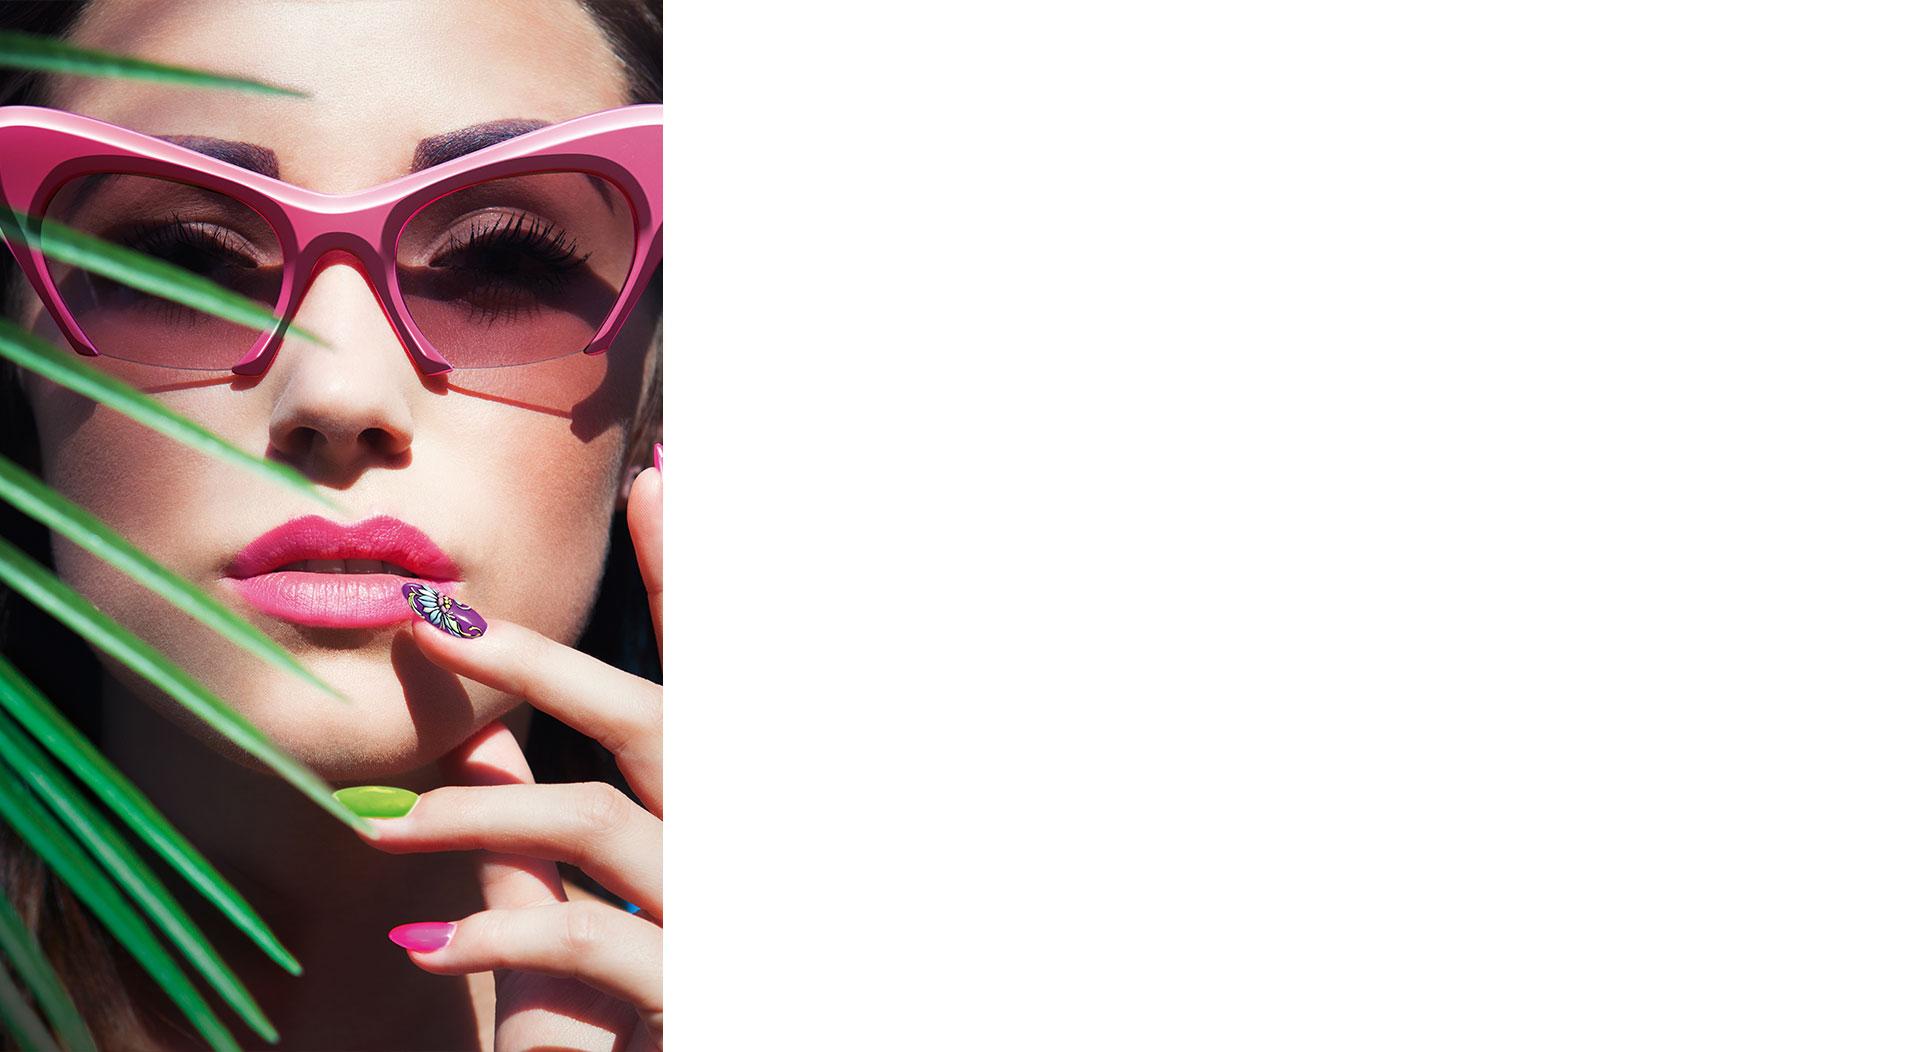 NAI_S cosmetics Silhouette gel